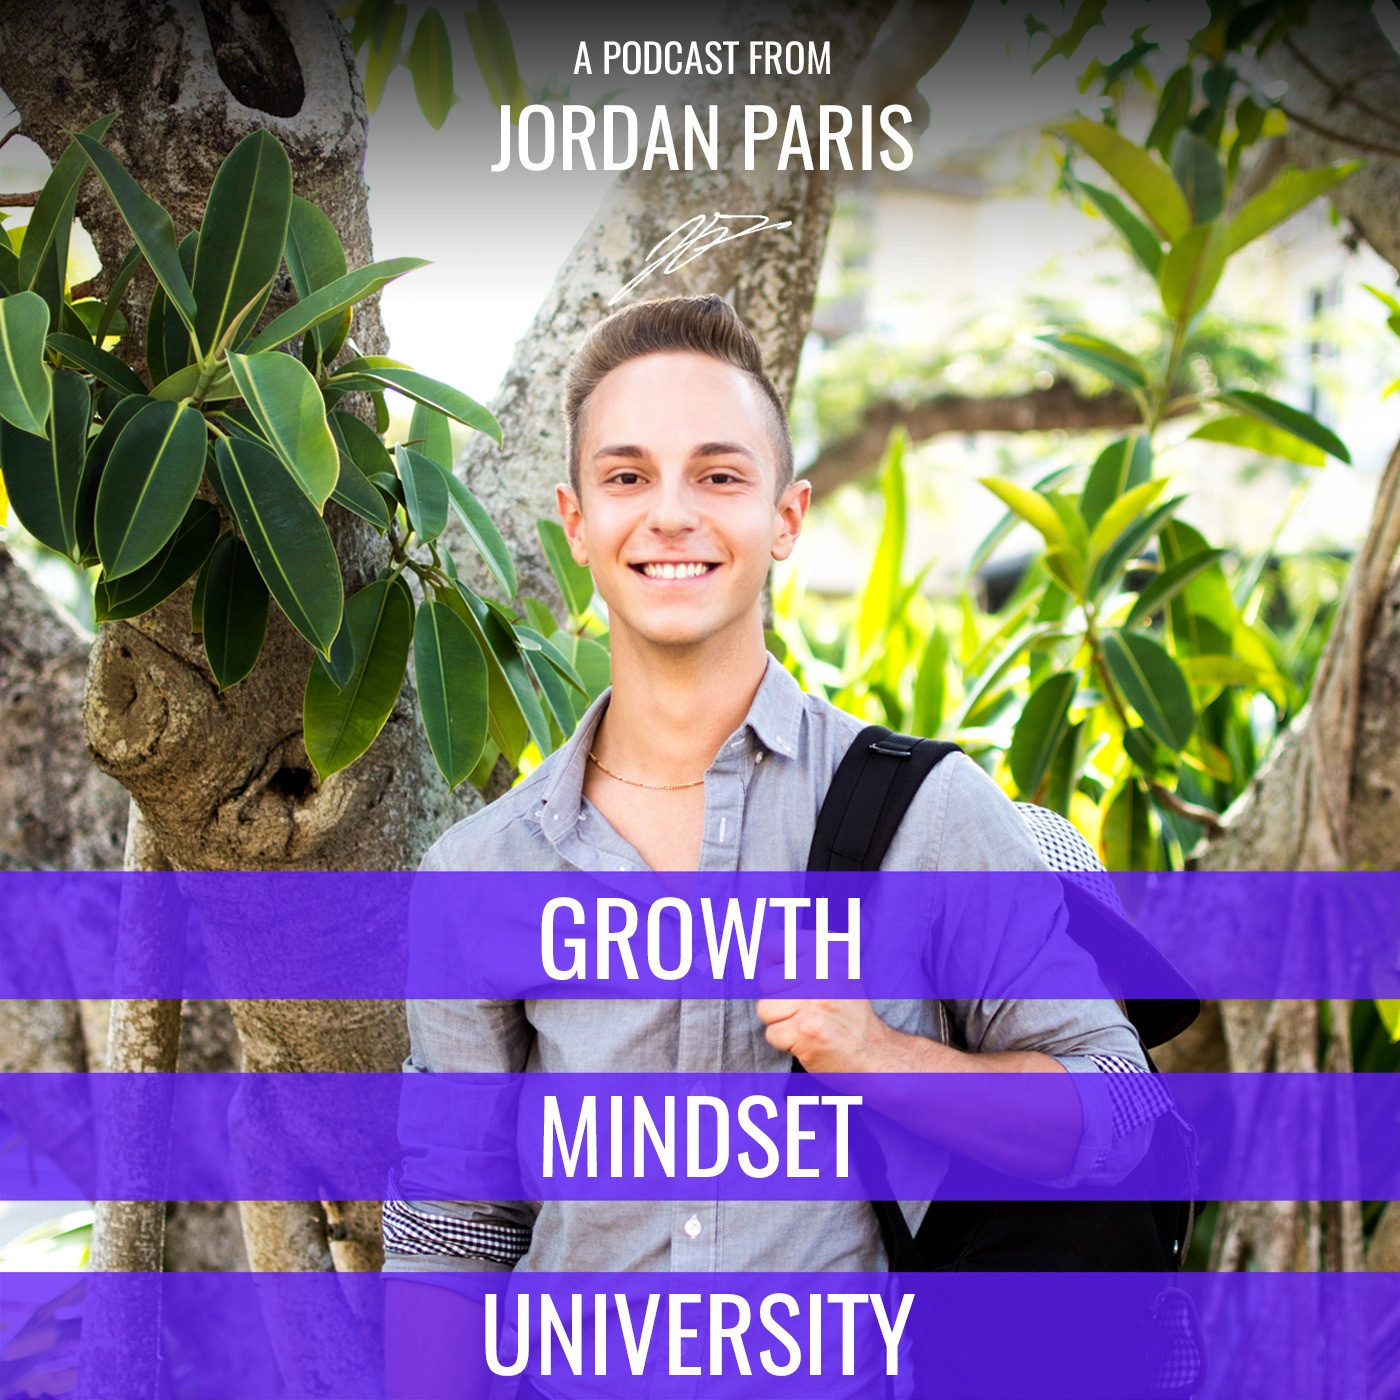 Growth Mindset University